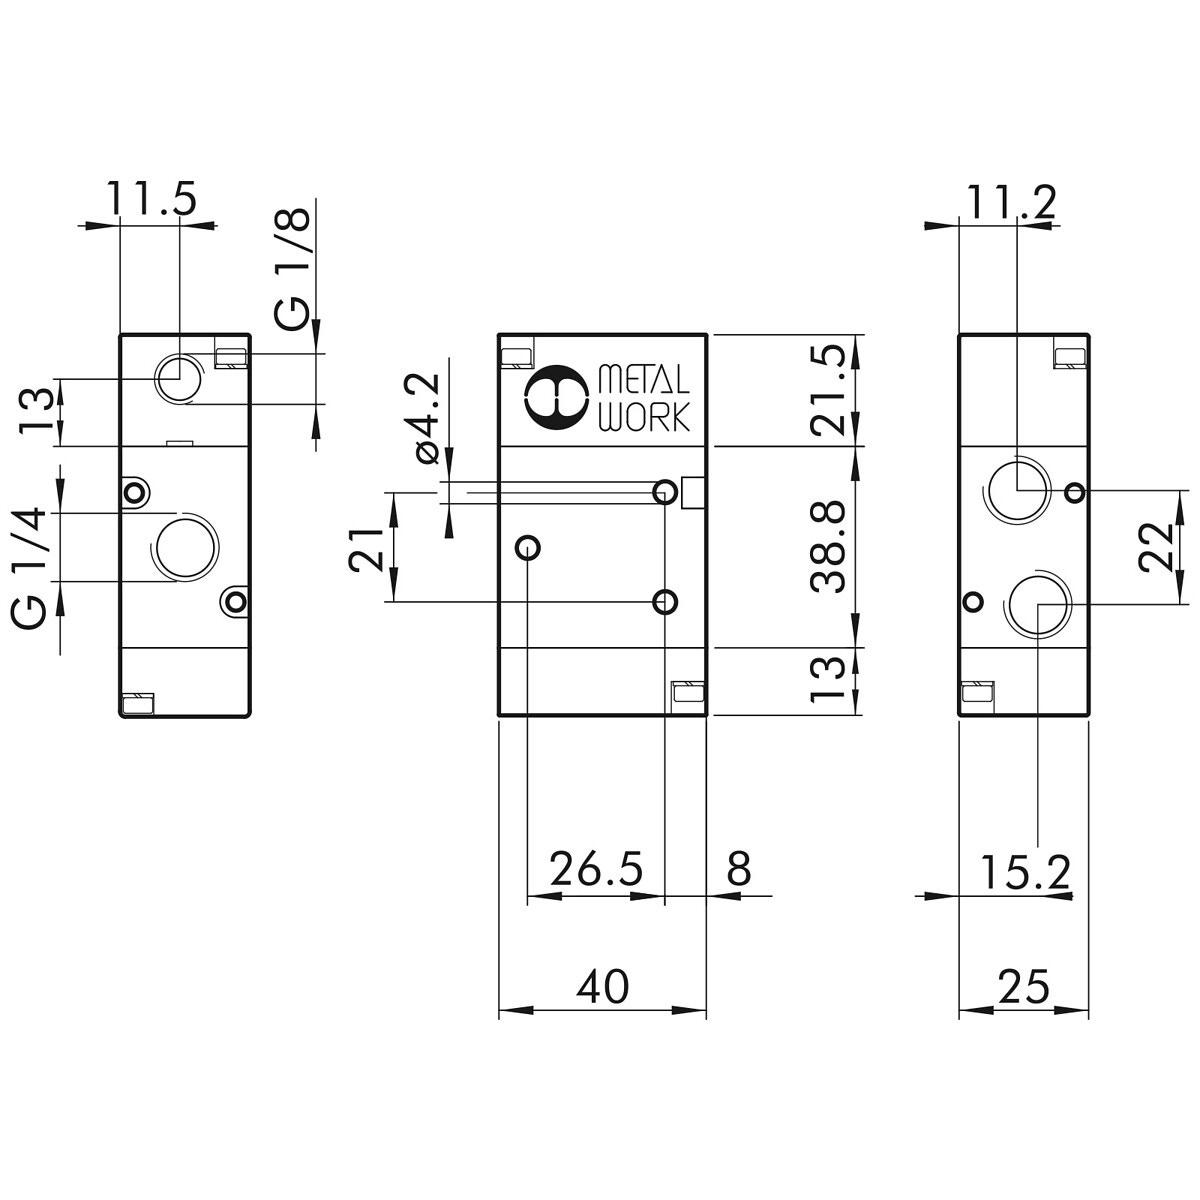 Pneumatic Control Valve 3 2 1 4 Pnv33pnsnc Mwp7020010200 Ikh Belarus Tractor Wiring Diagram